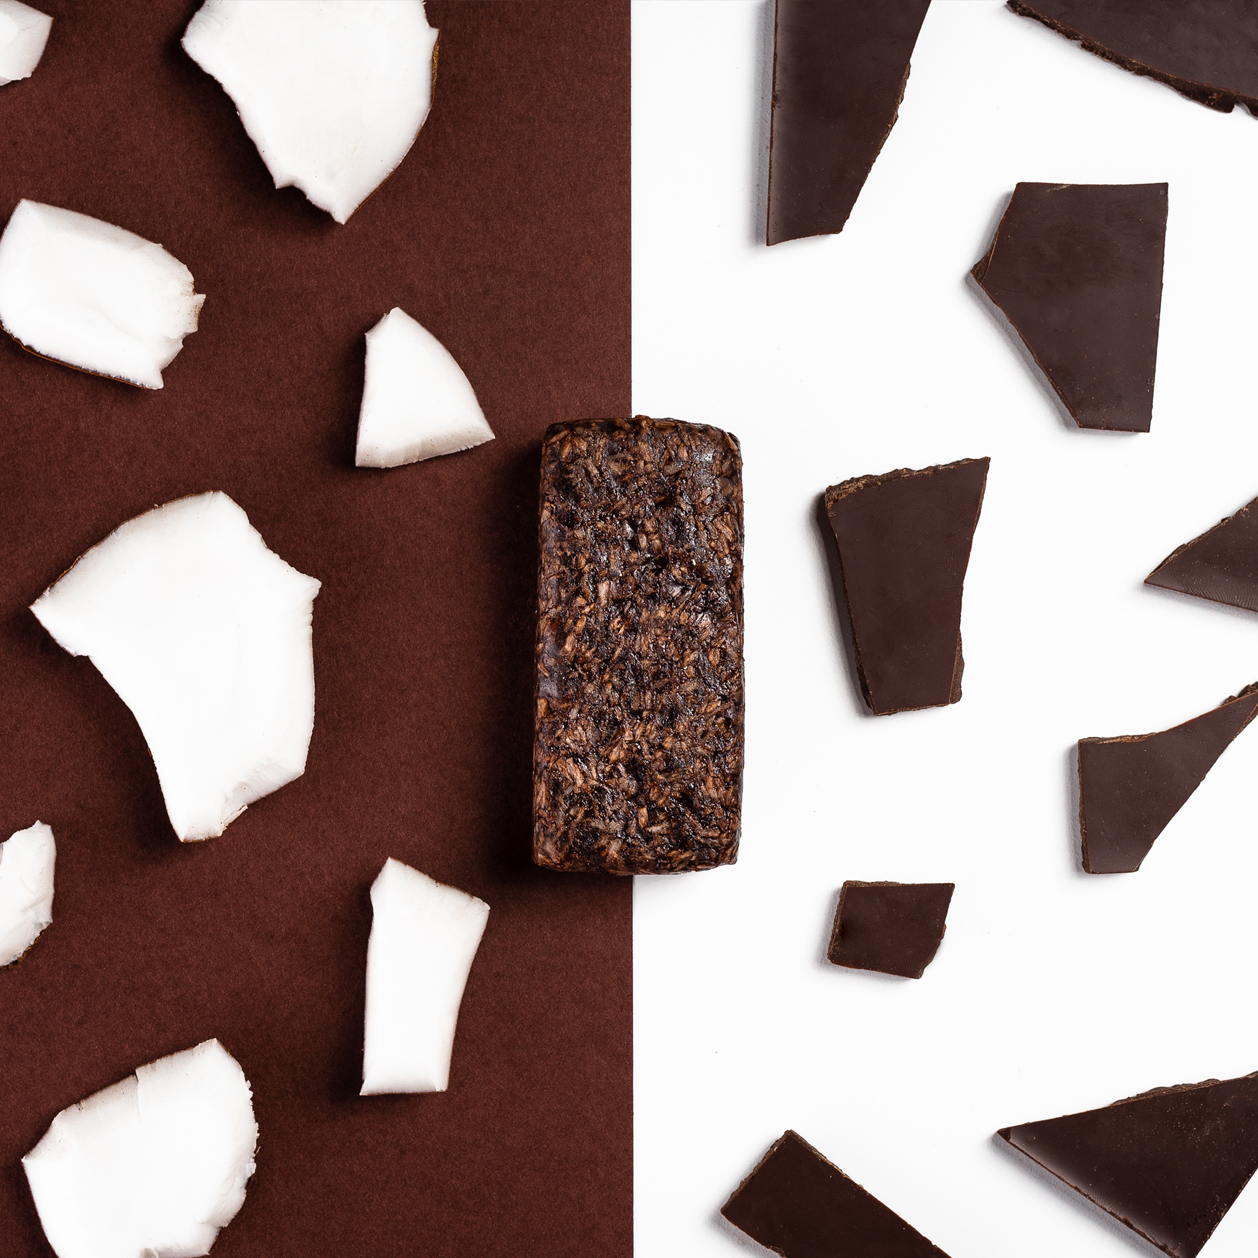 cokolada stvorec 3